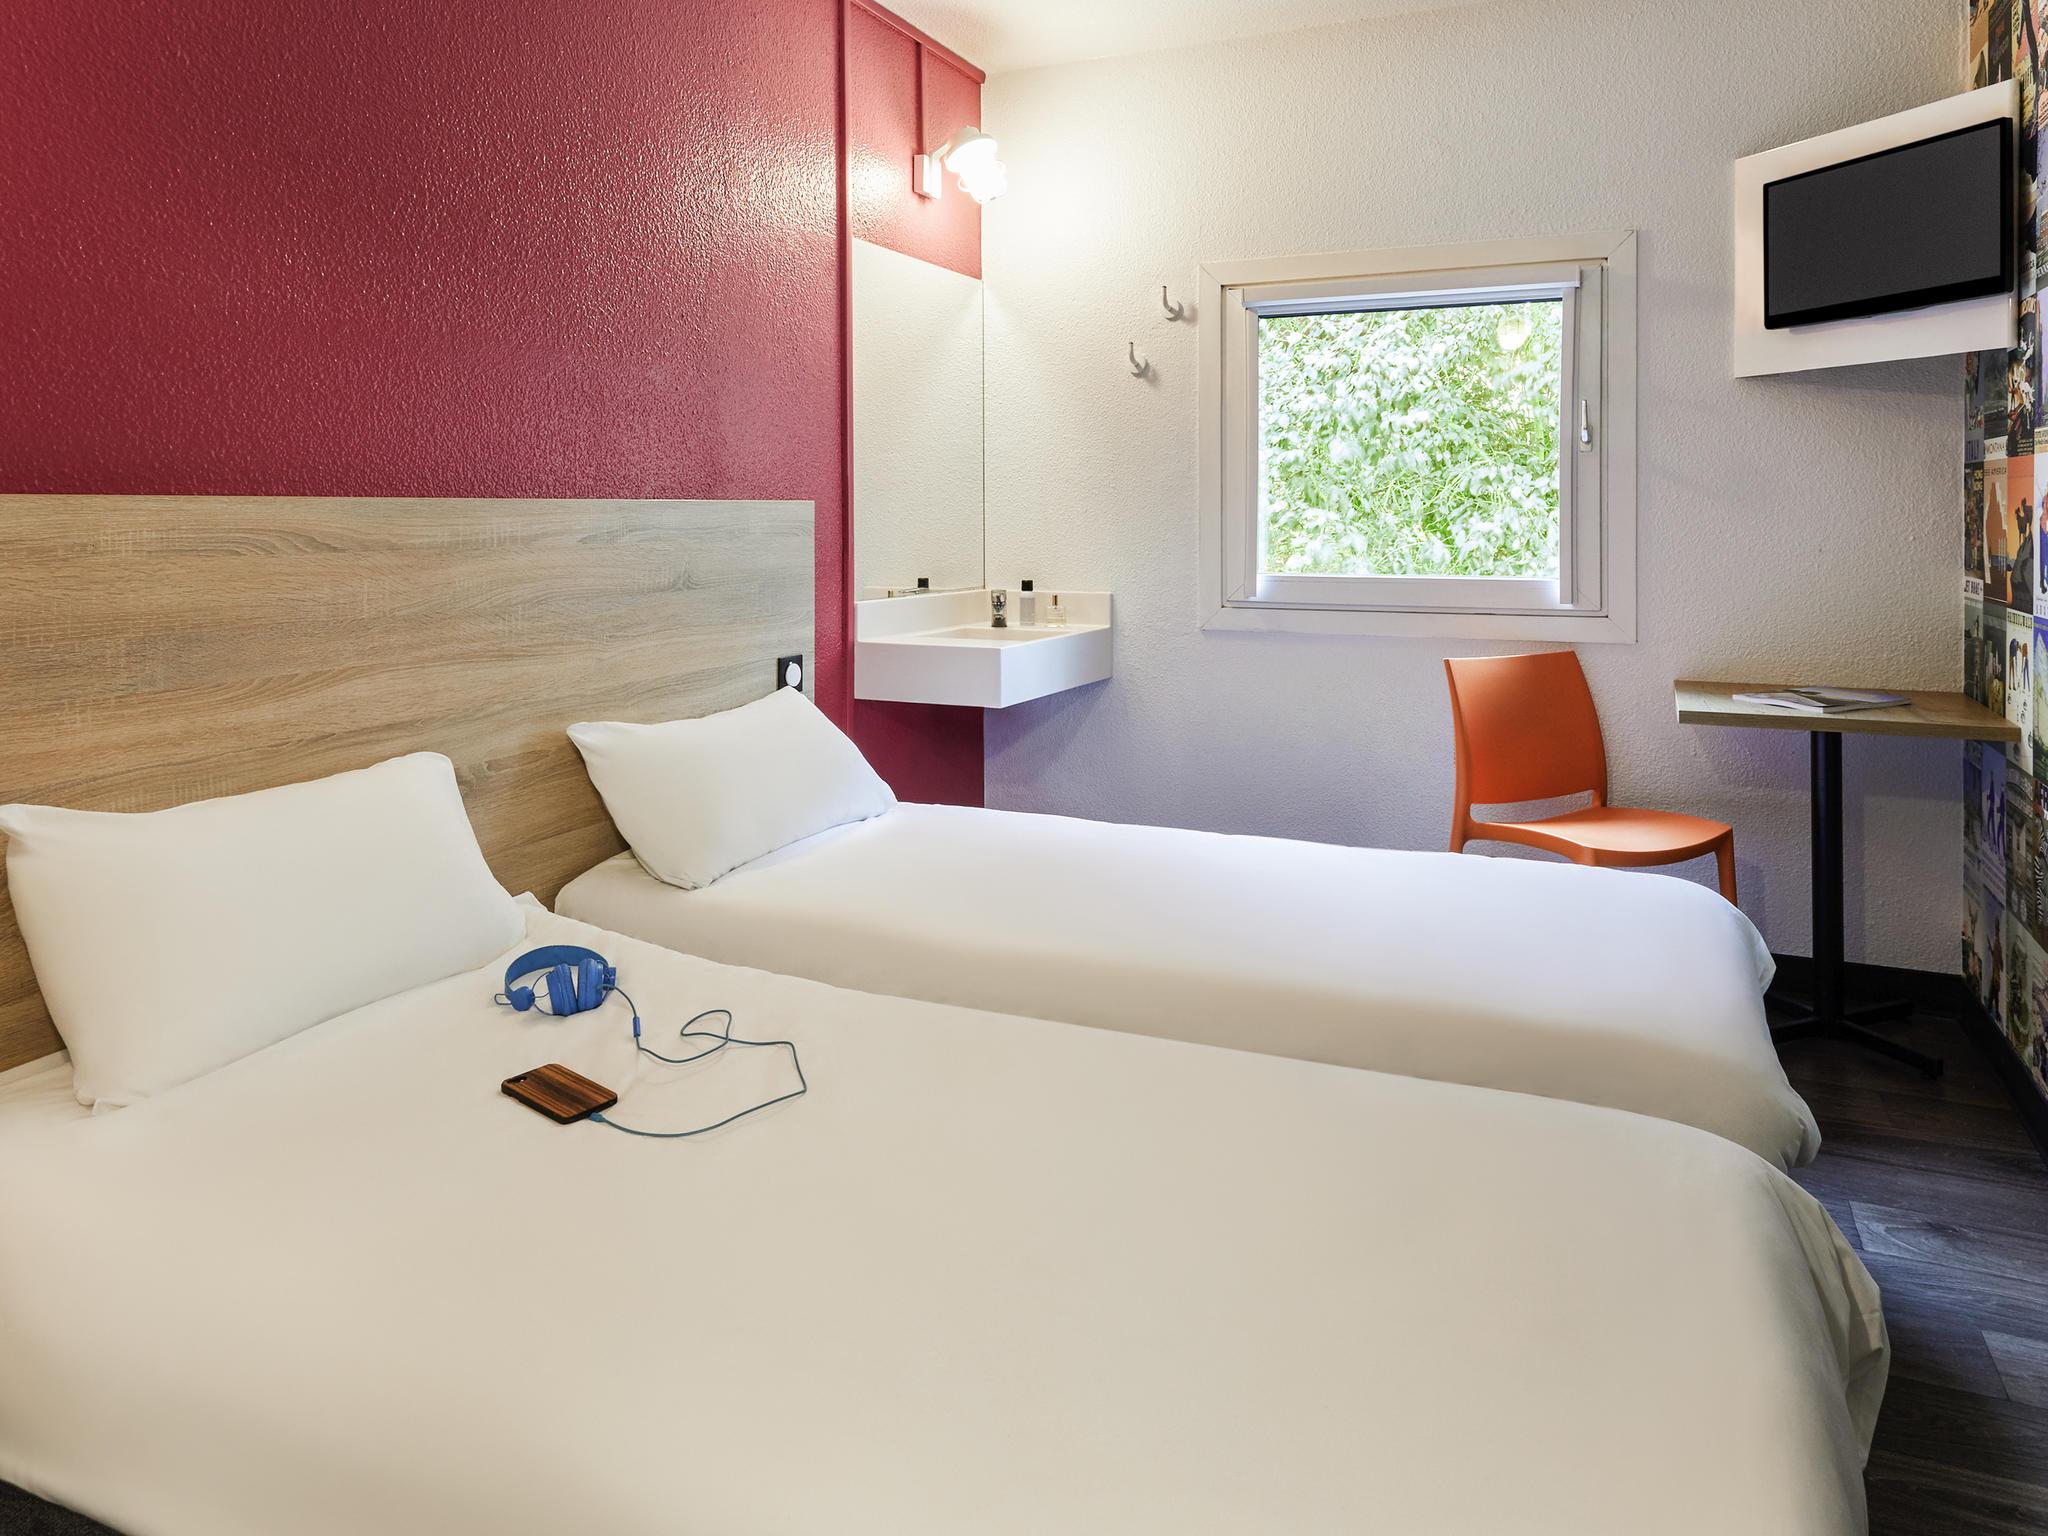 Otel – hotelF1 Saint-Étienne (rénové)